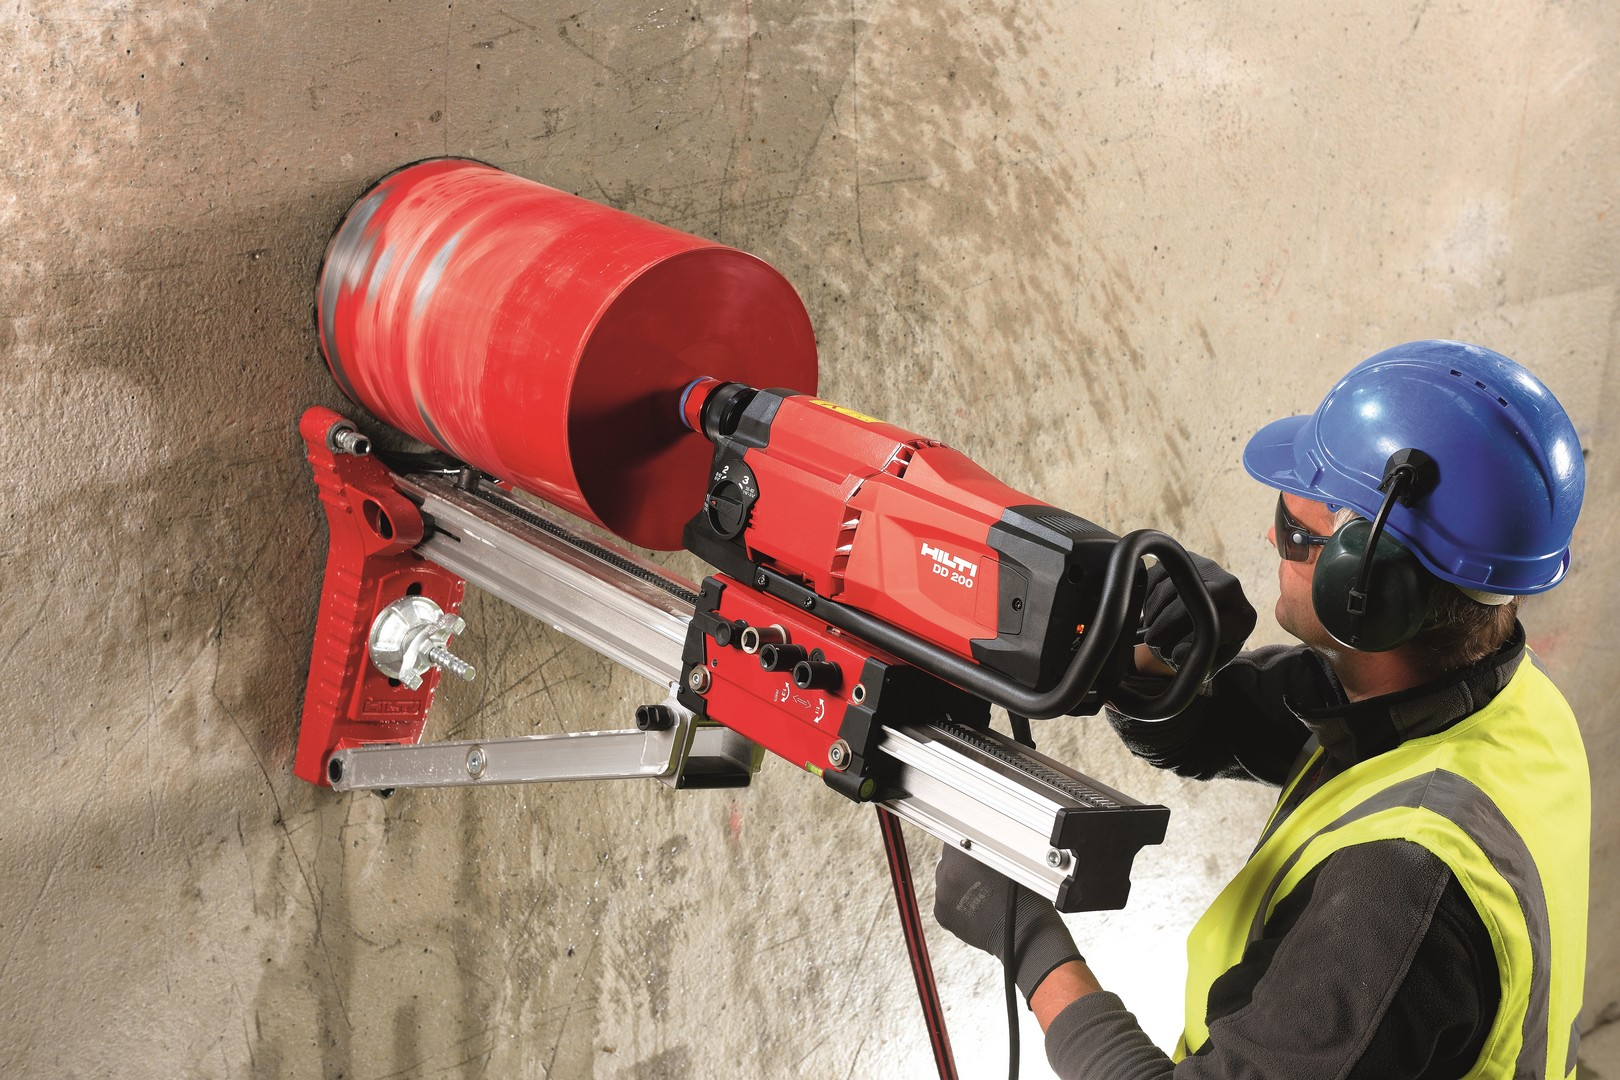 Hilti DD 200 Diamond Coring Drill 110v 13.9kg